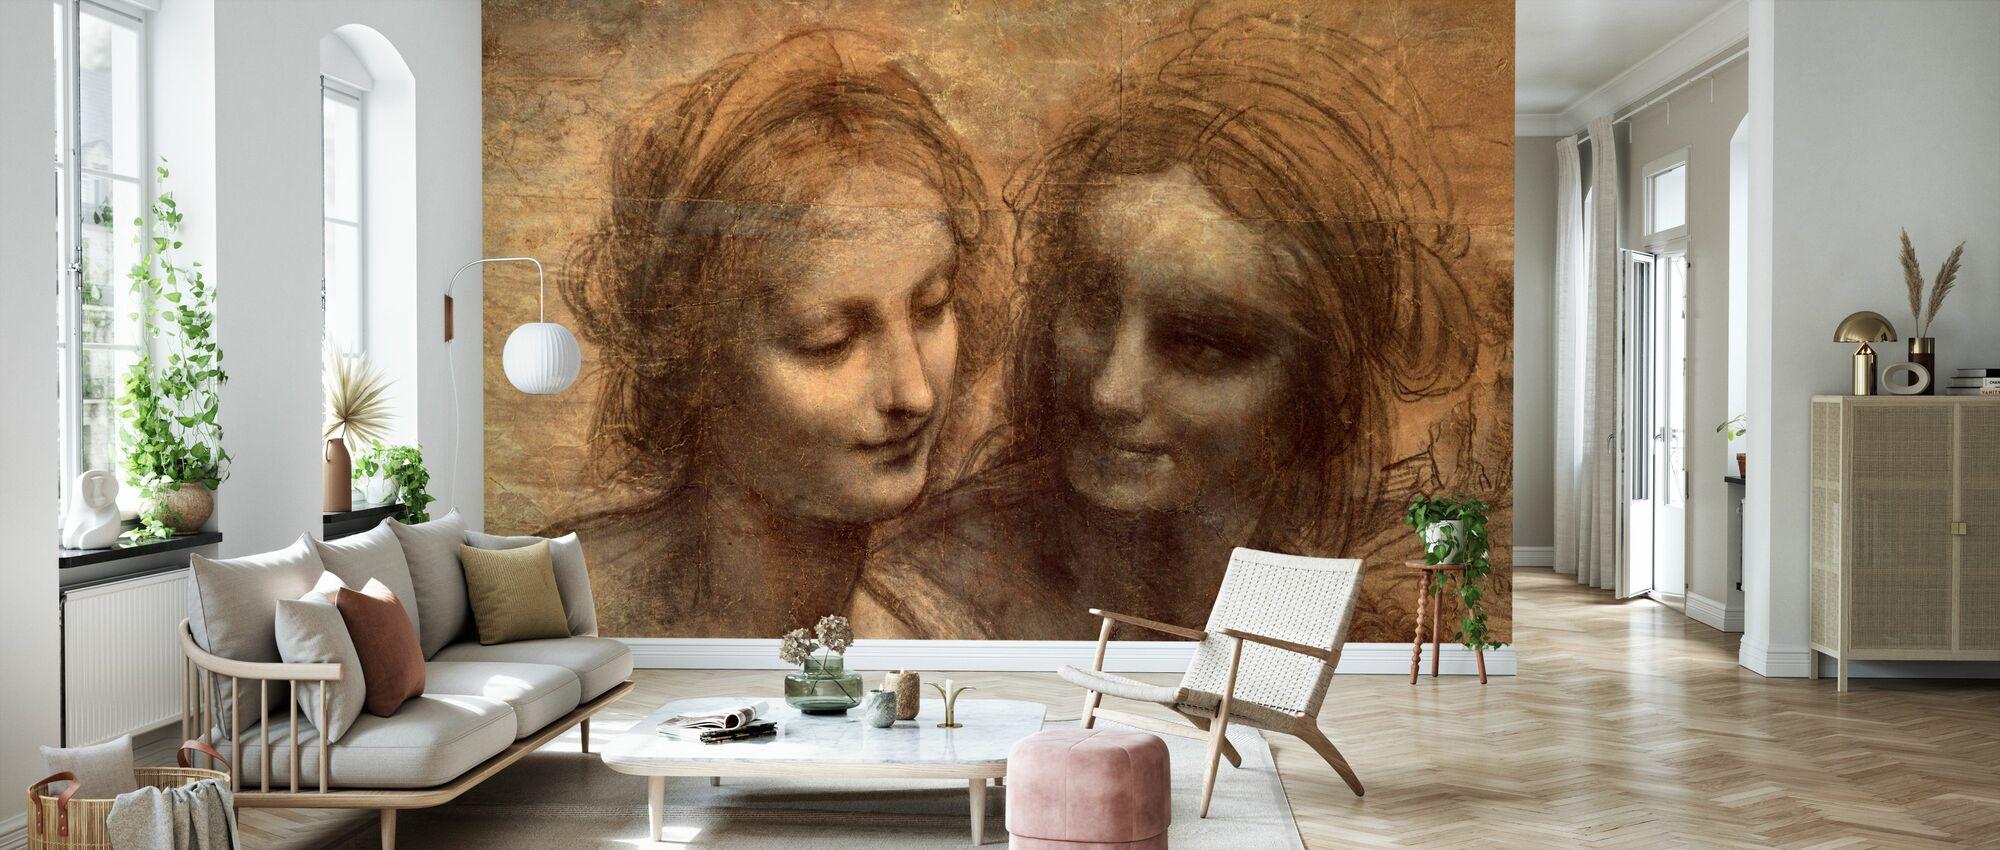 Virgin and Child - Leonardo da Vinci - Wallpaper - Living Room